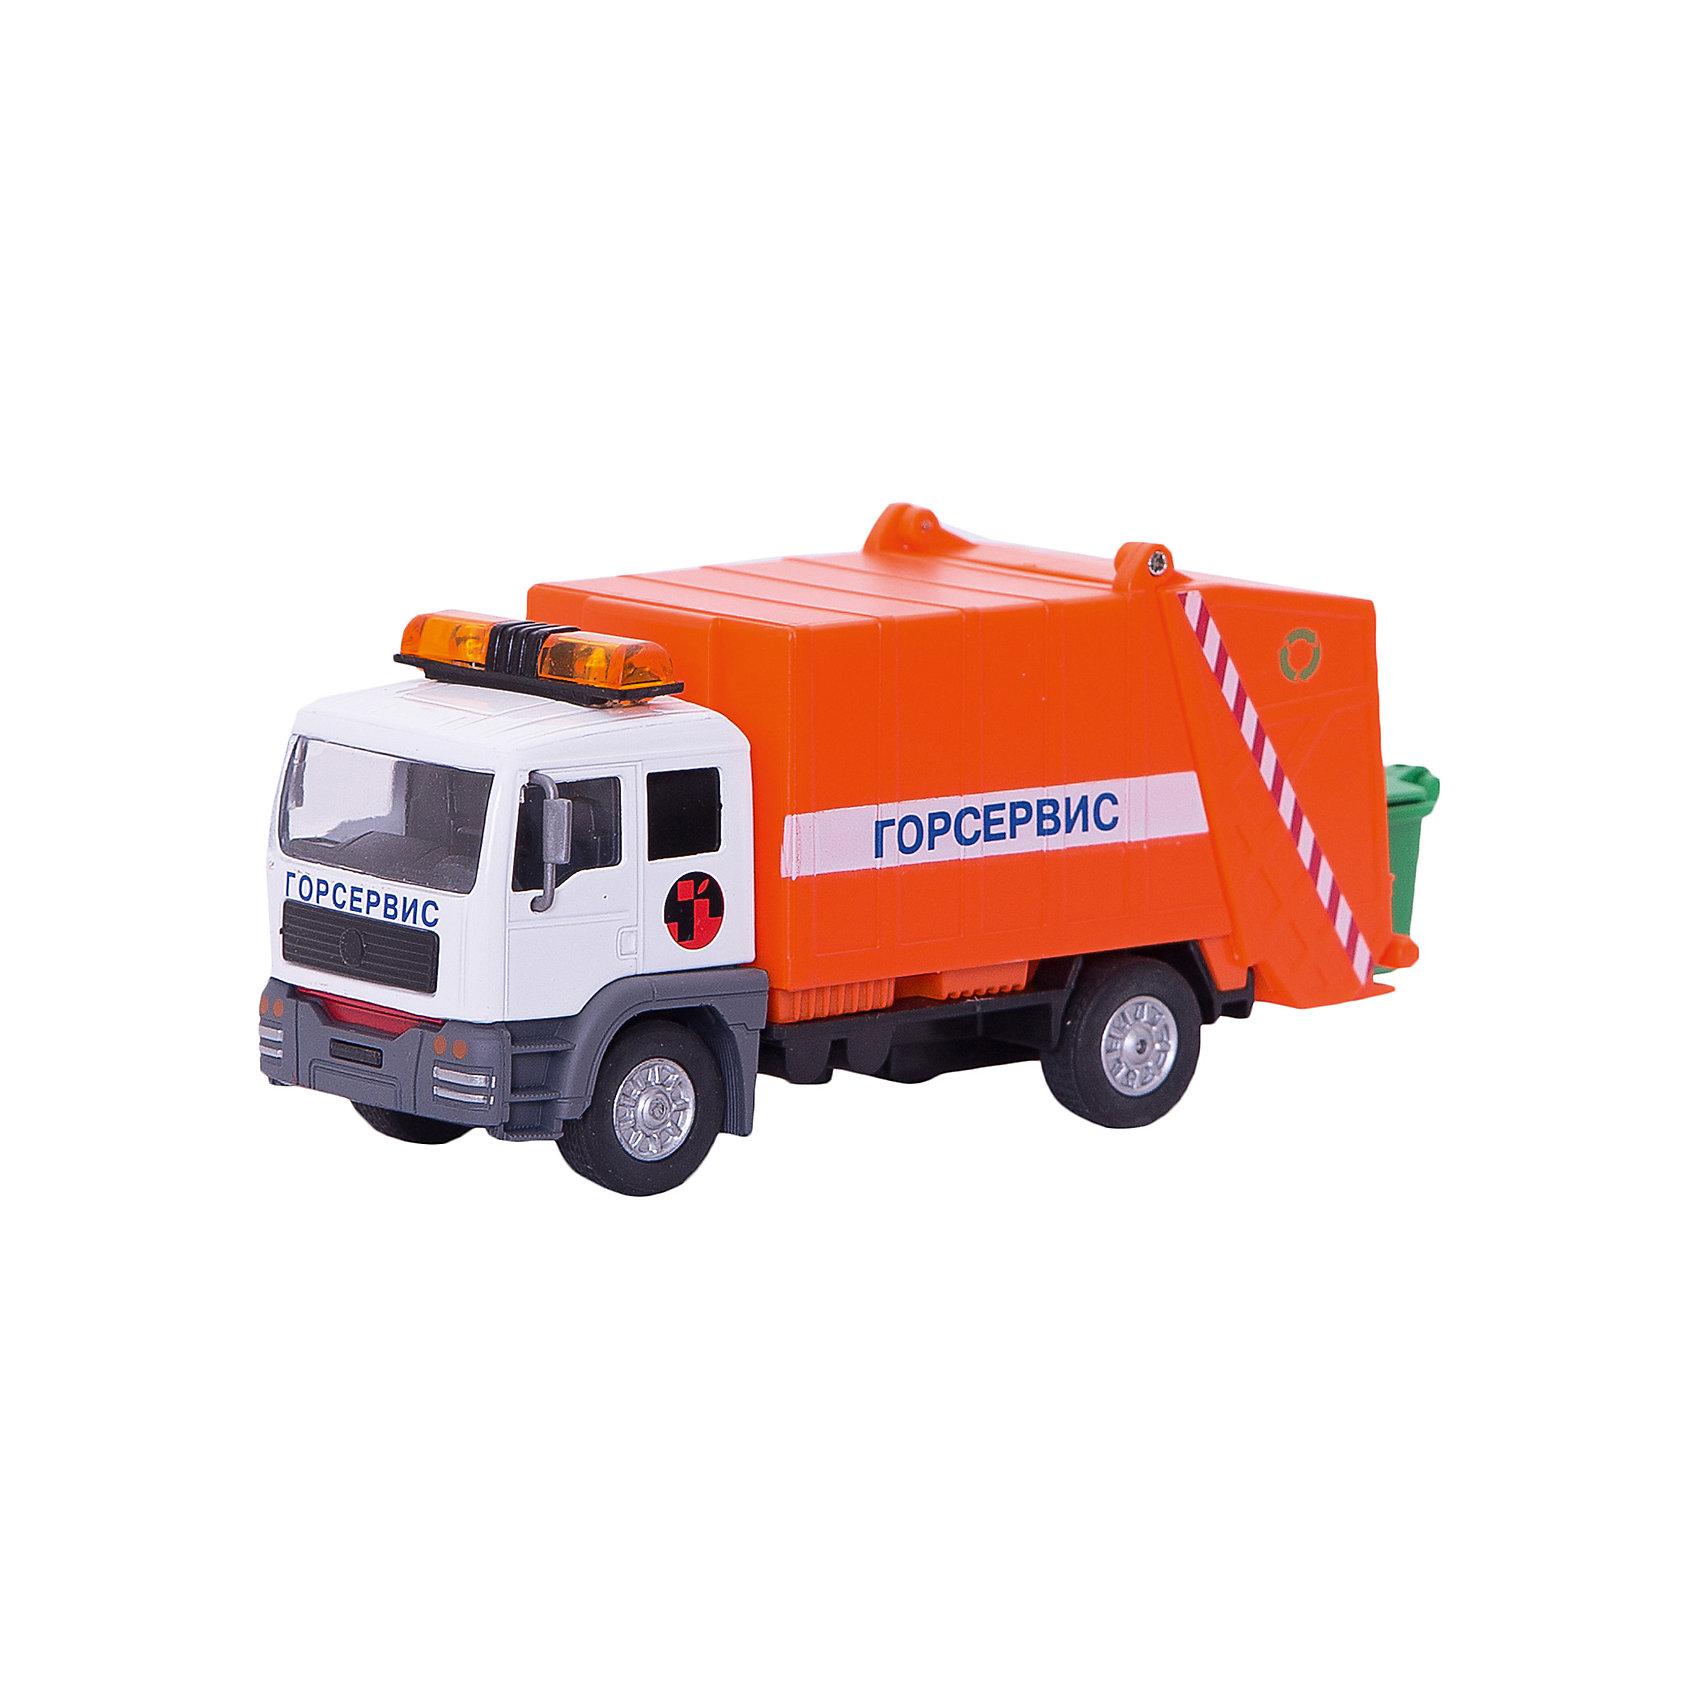 ТЕХНОПАРК ТЕХНОПАРК Мусоровоз машинки технопарк грузовик технопарк металлический инерционный 12 см